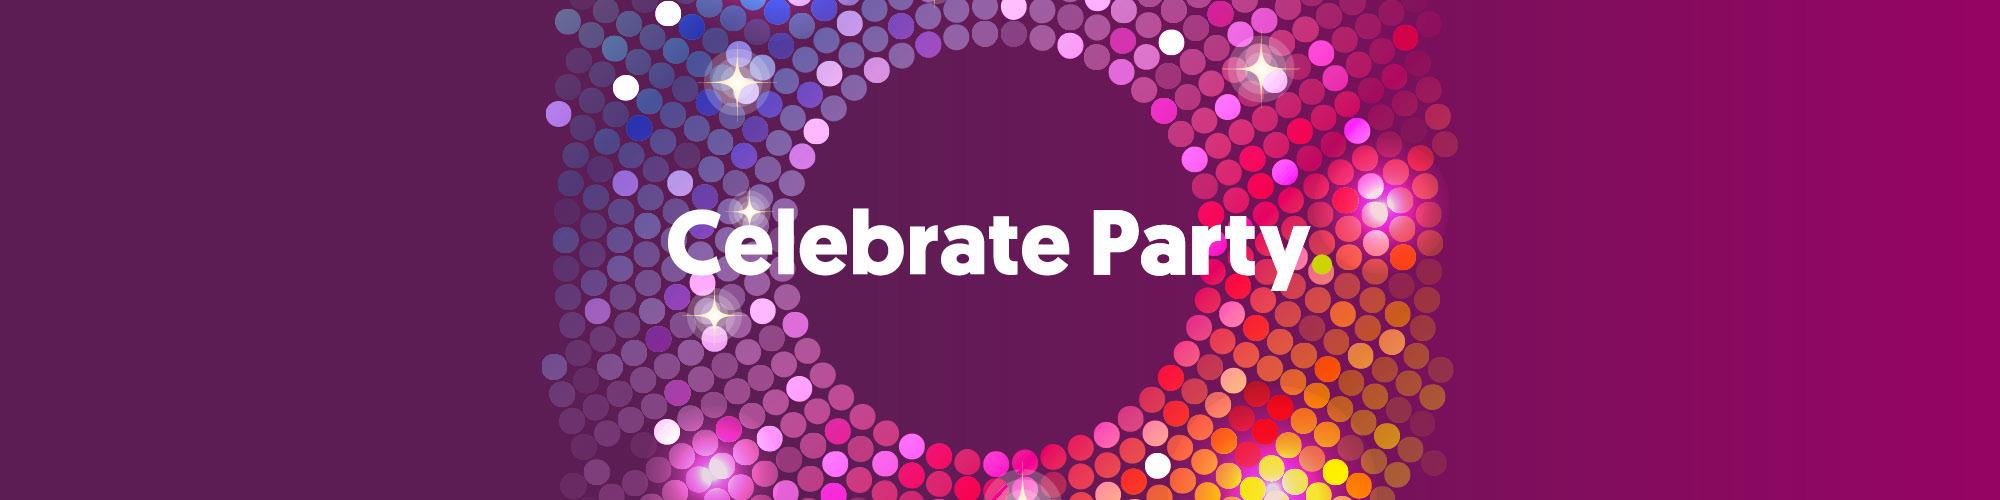 Celebrate party 2000x500 1